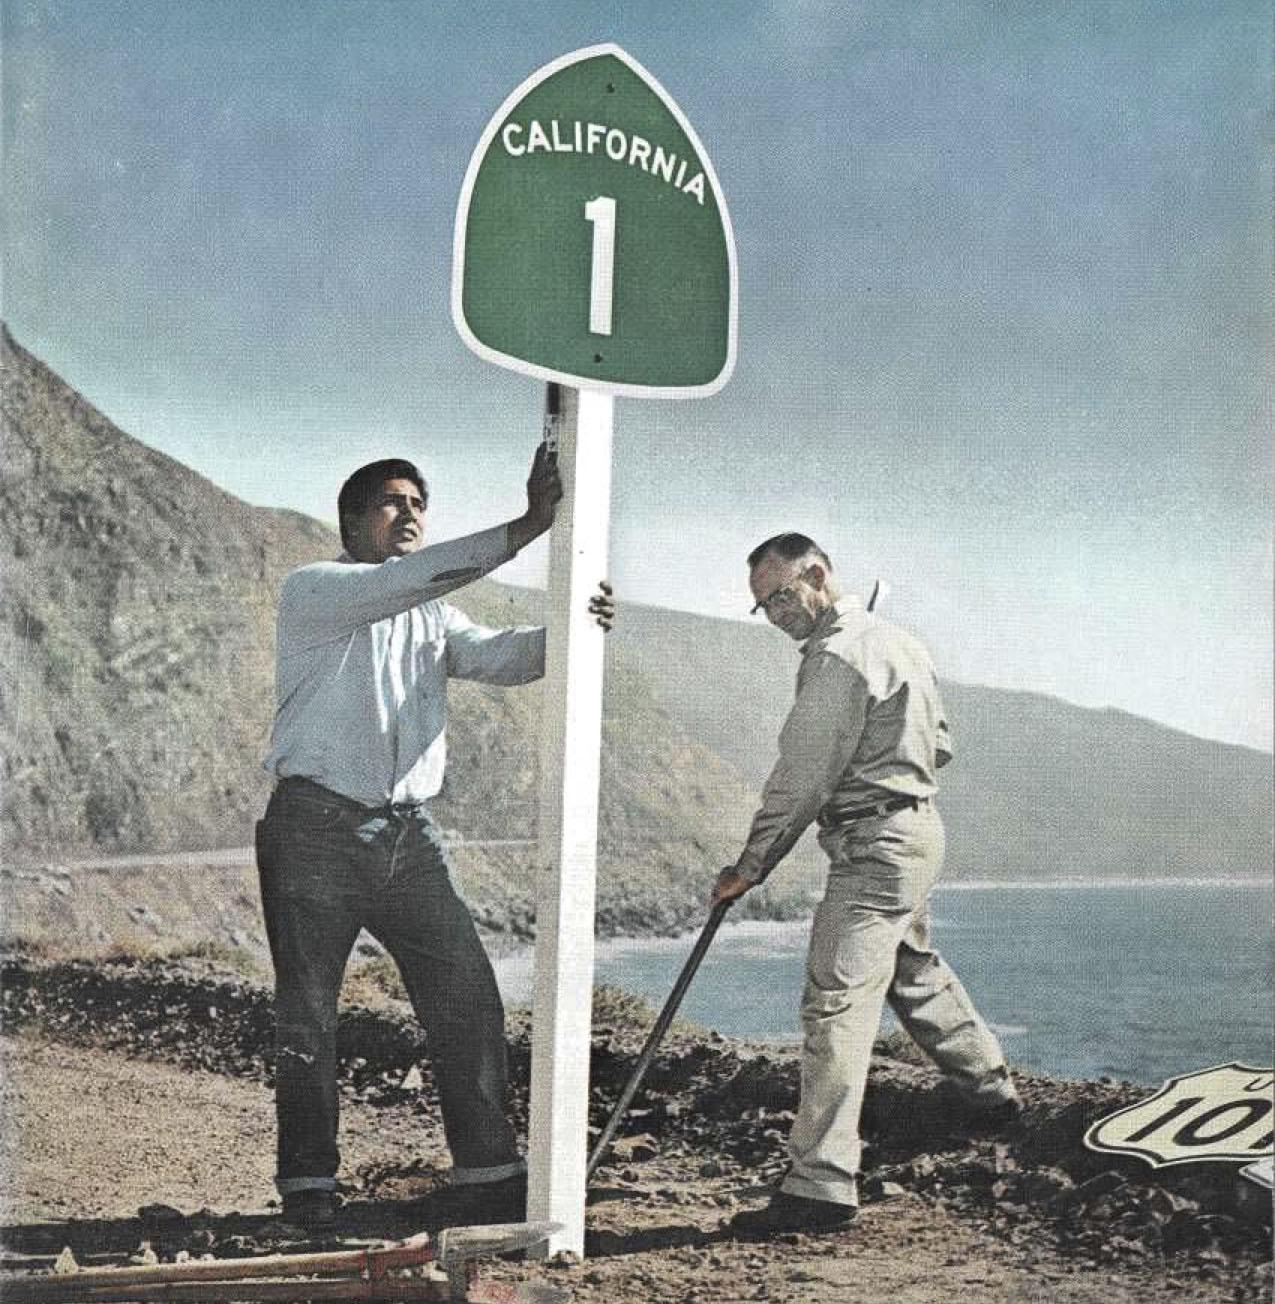 highway_one_shield_1964-thumb-600x613-98560.jpg